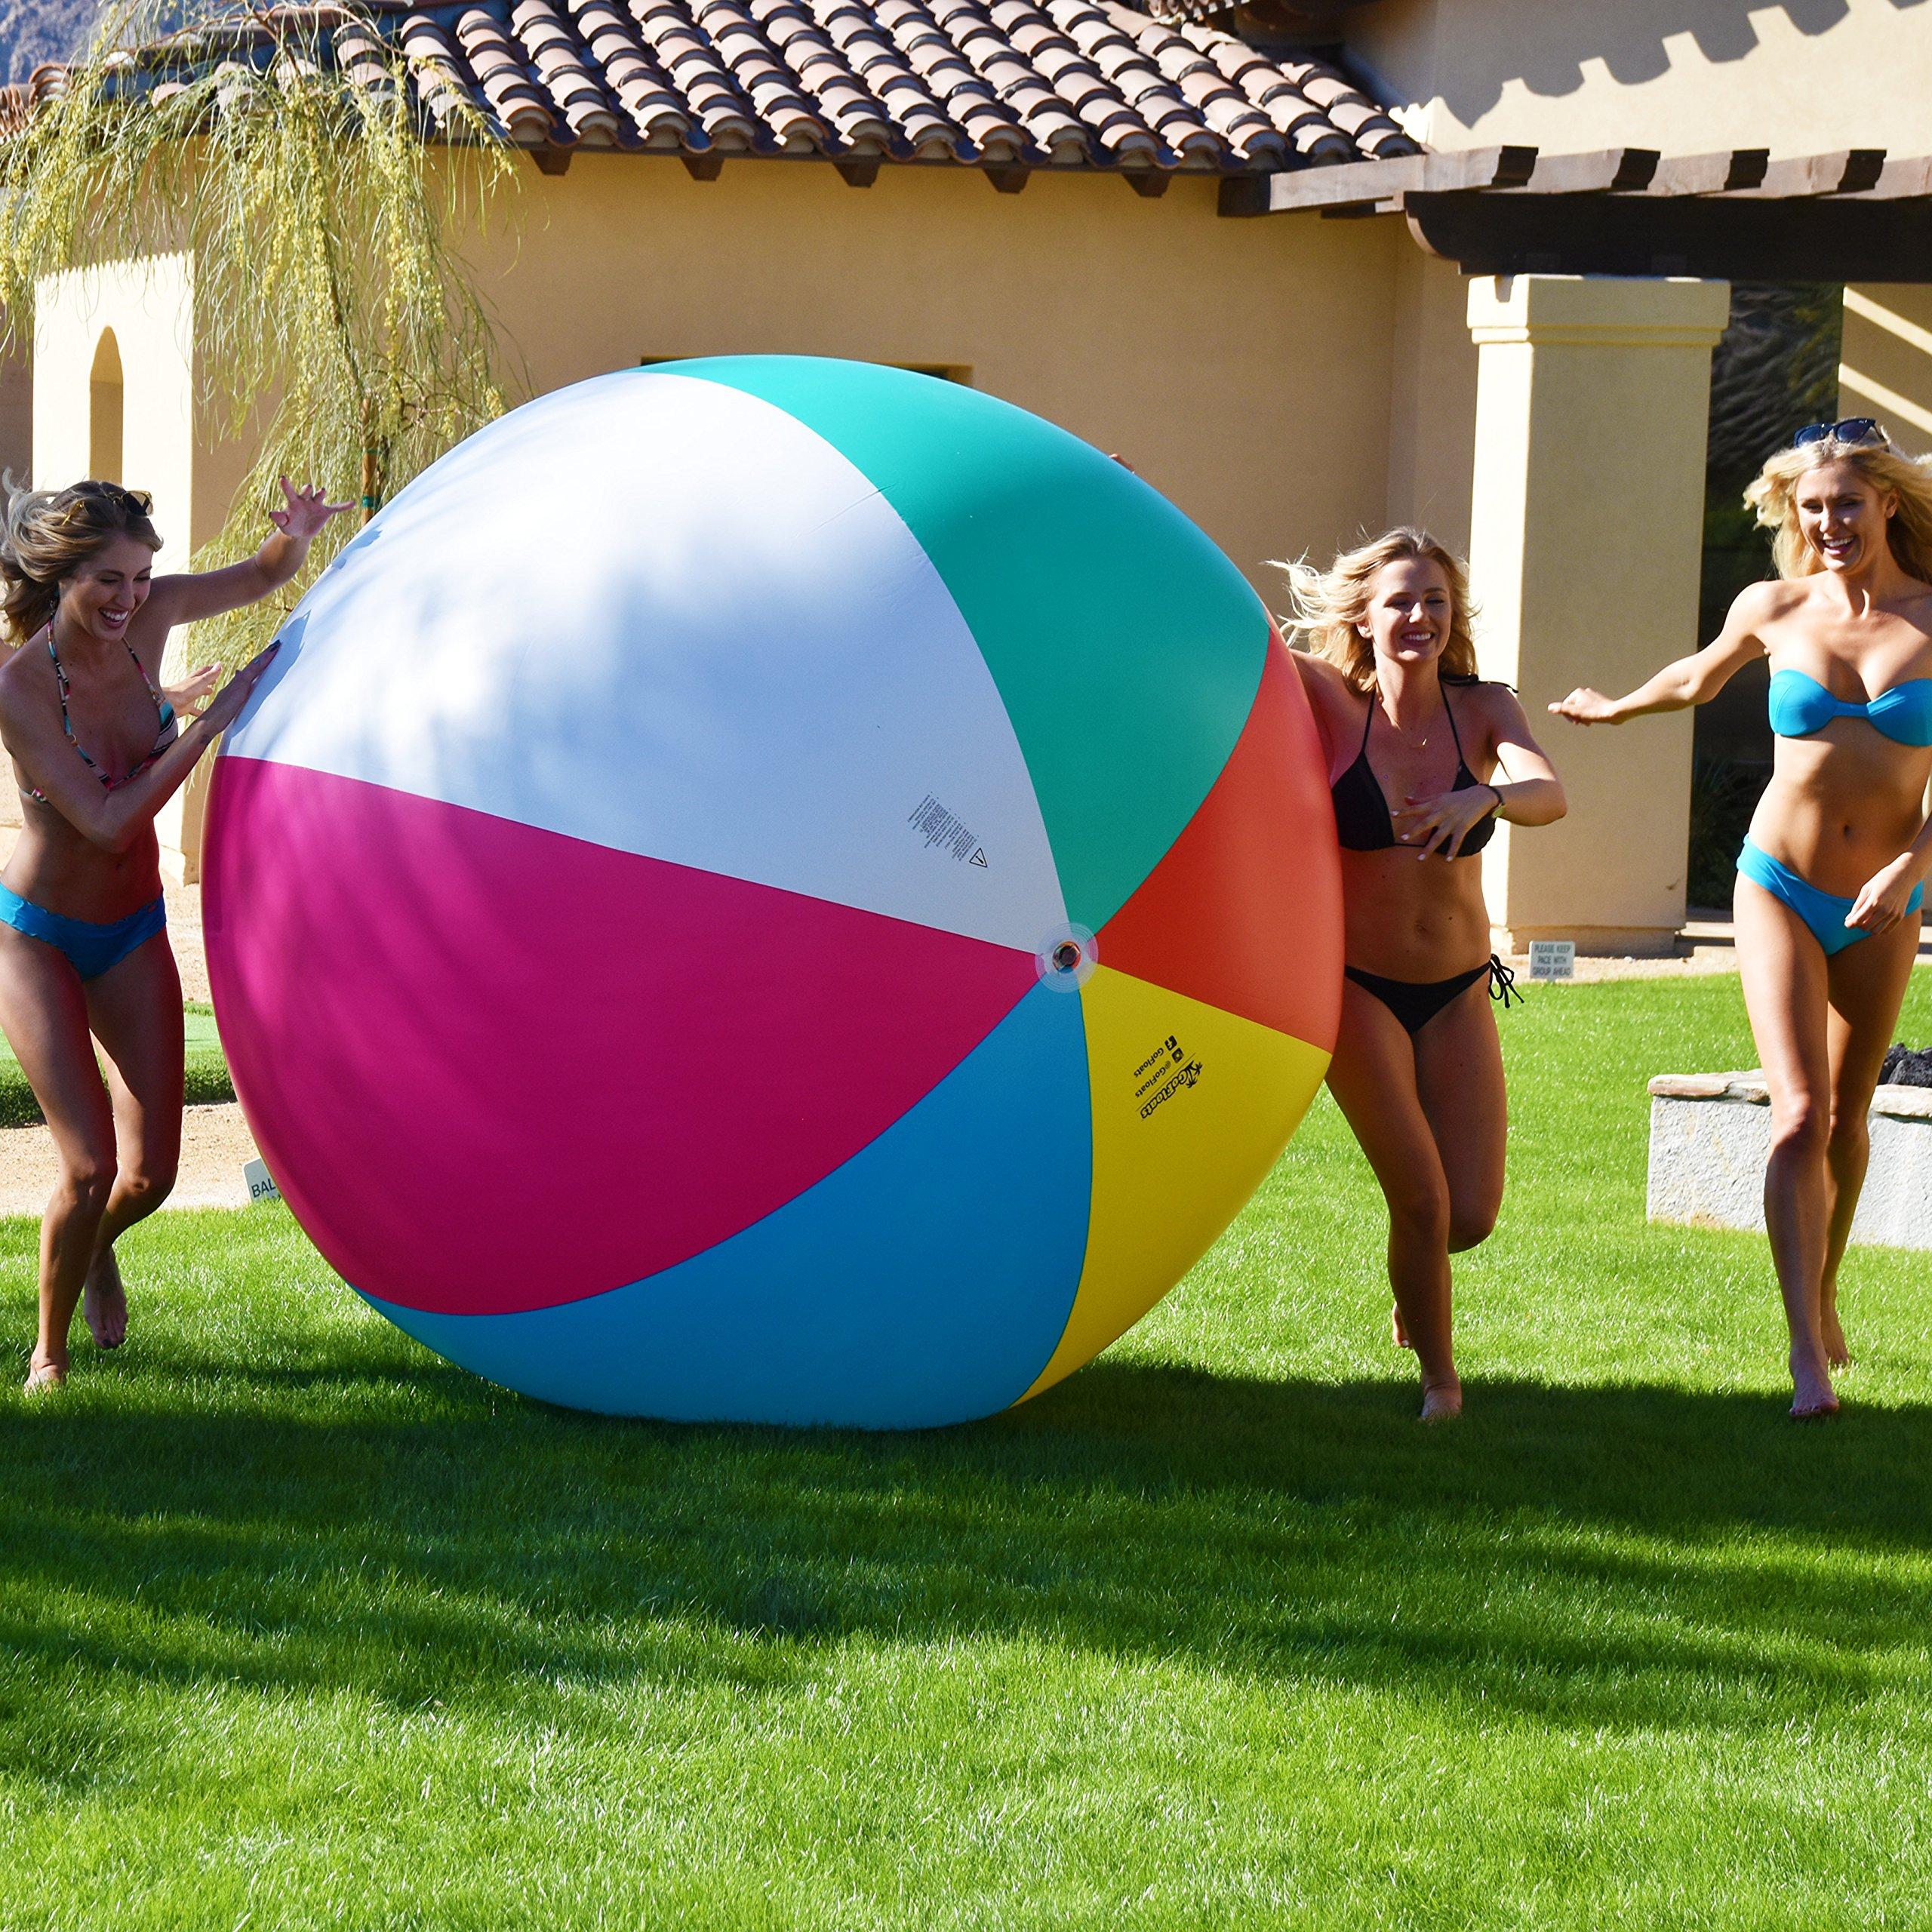 6' Giant Inflatable Beach Ball For Summer Beach Backyard